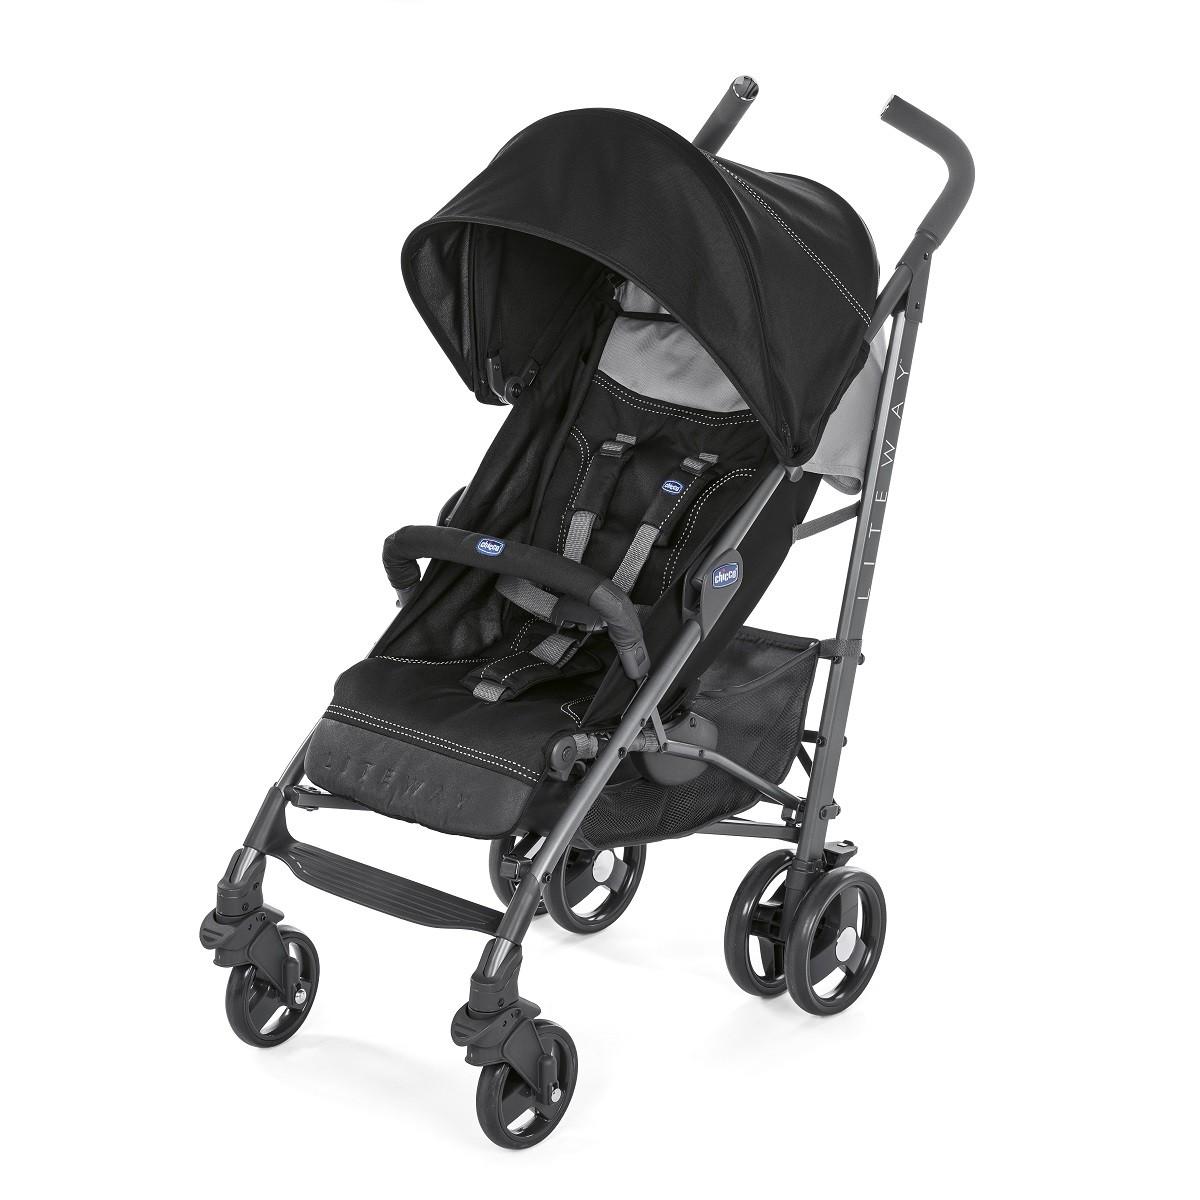 Carrinho de bebê Lite Way Jet Black - Chicco